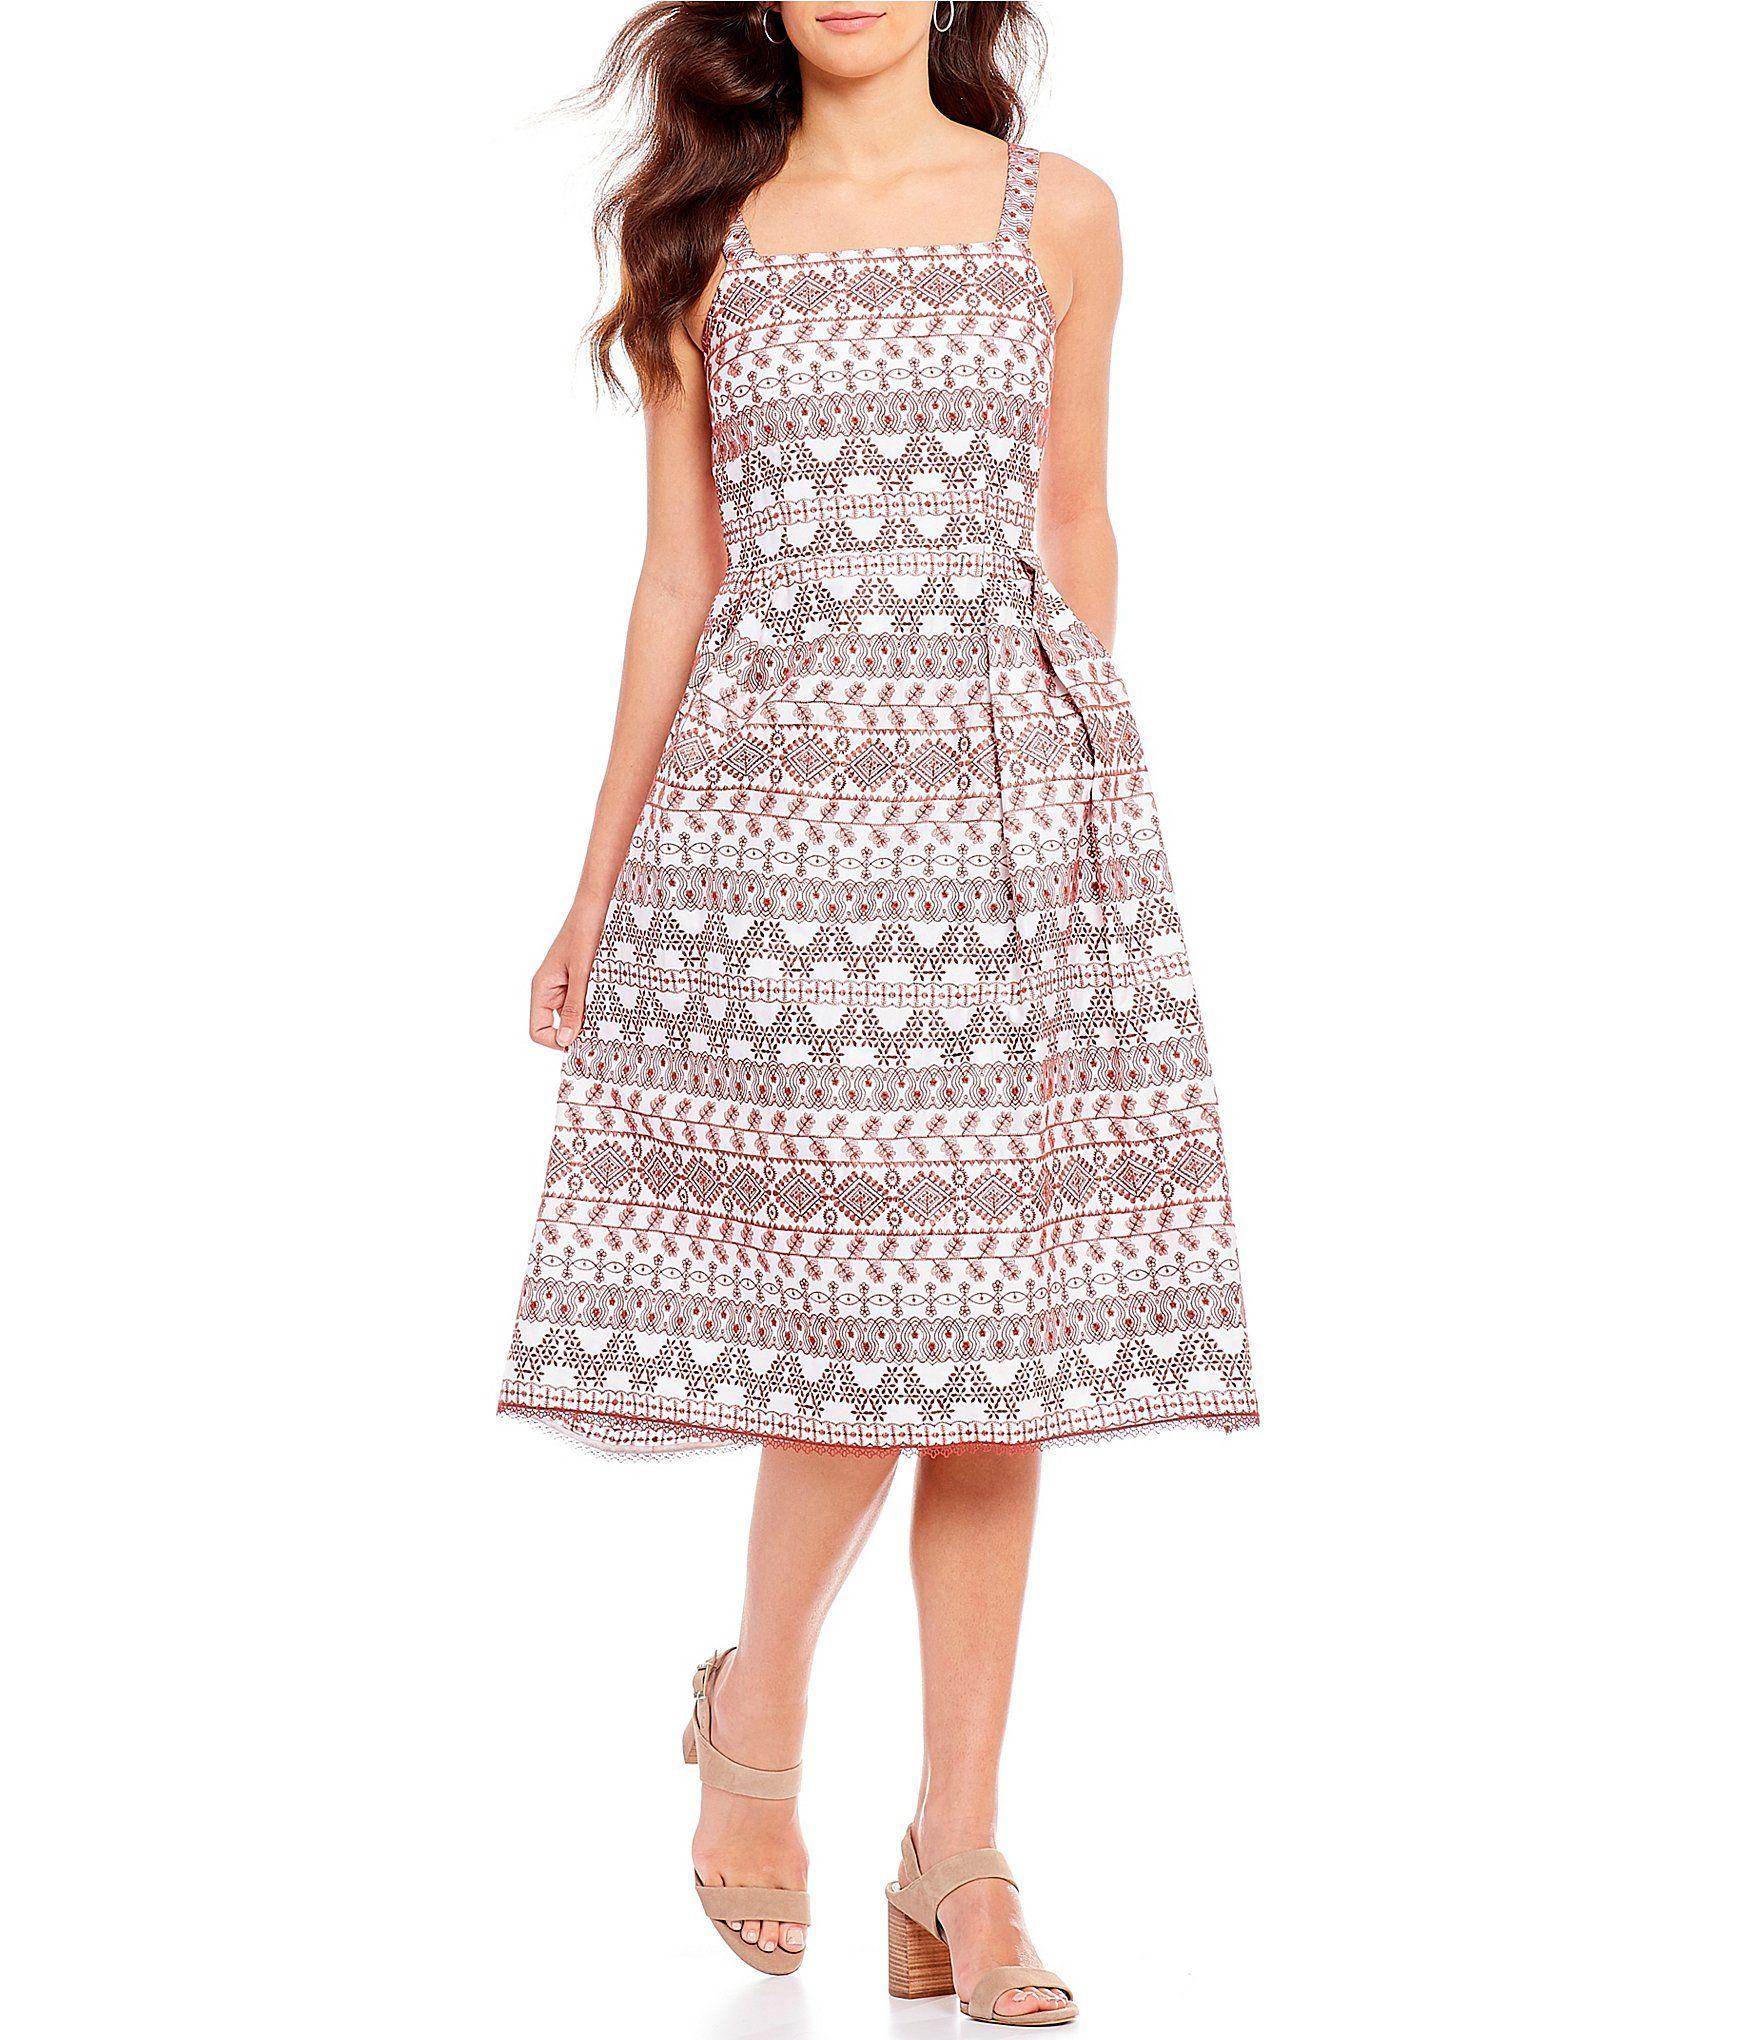 d950c6075b7 Antonio Melani Tammy Midi Dress  Dillards Work Dresses For Women